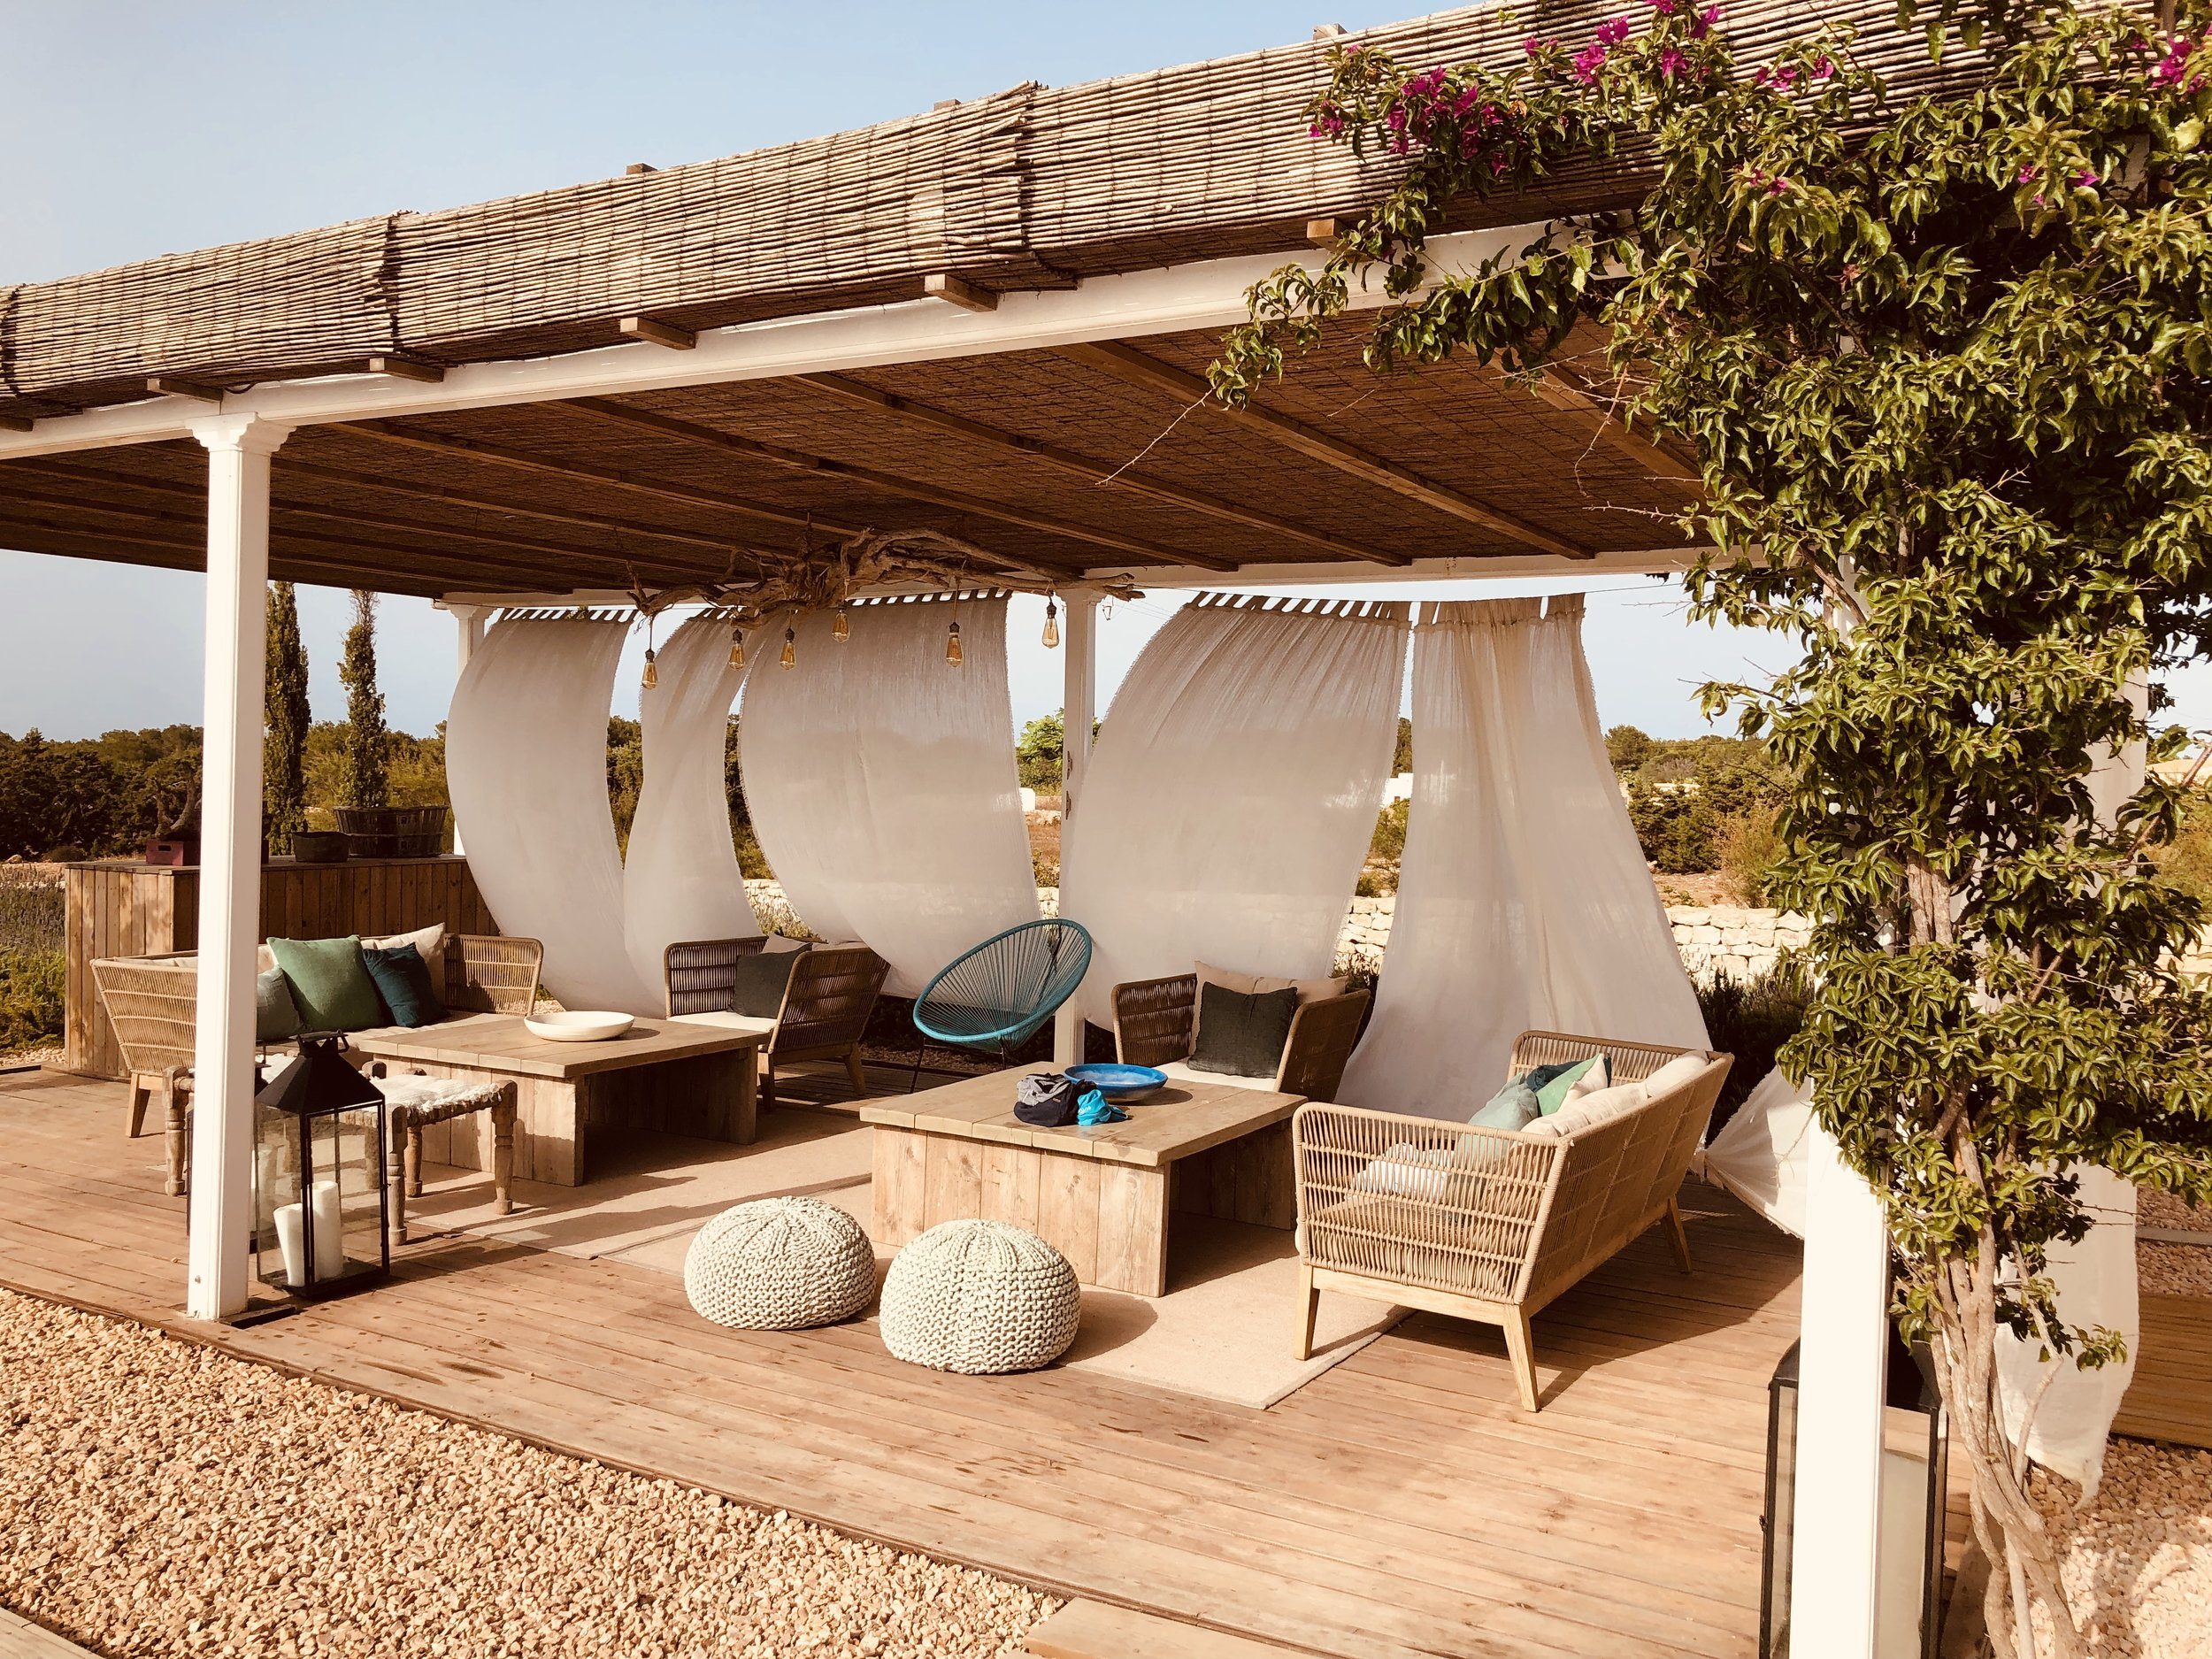 Somnis_Formentera_terrace.jpeg